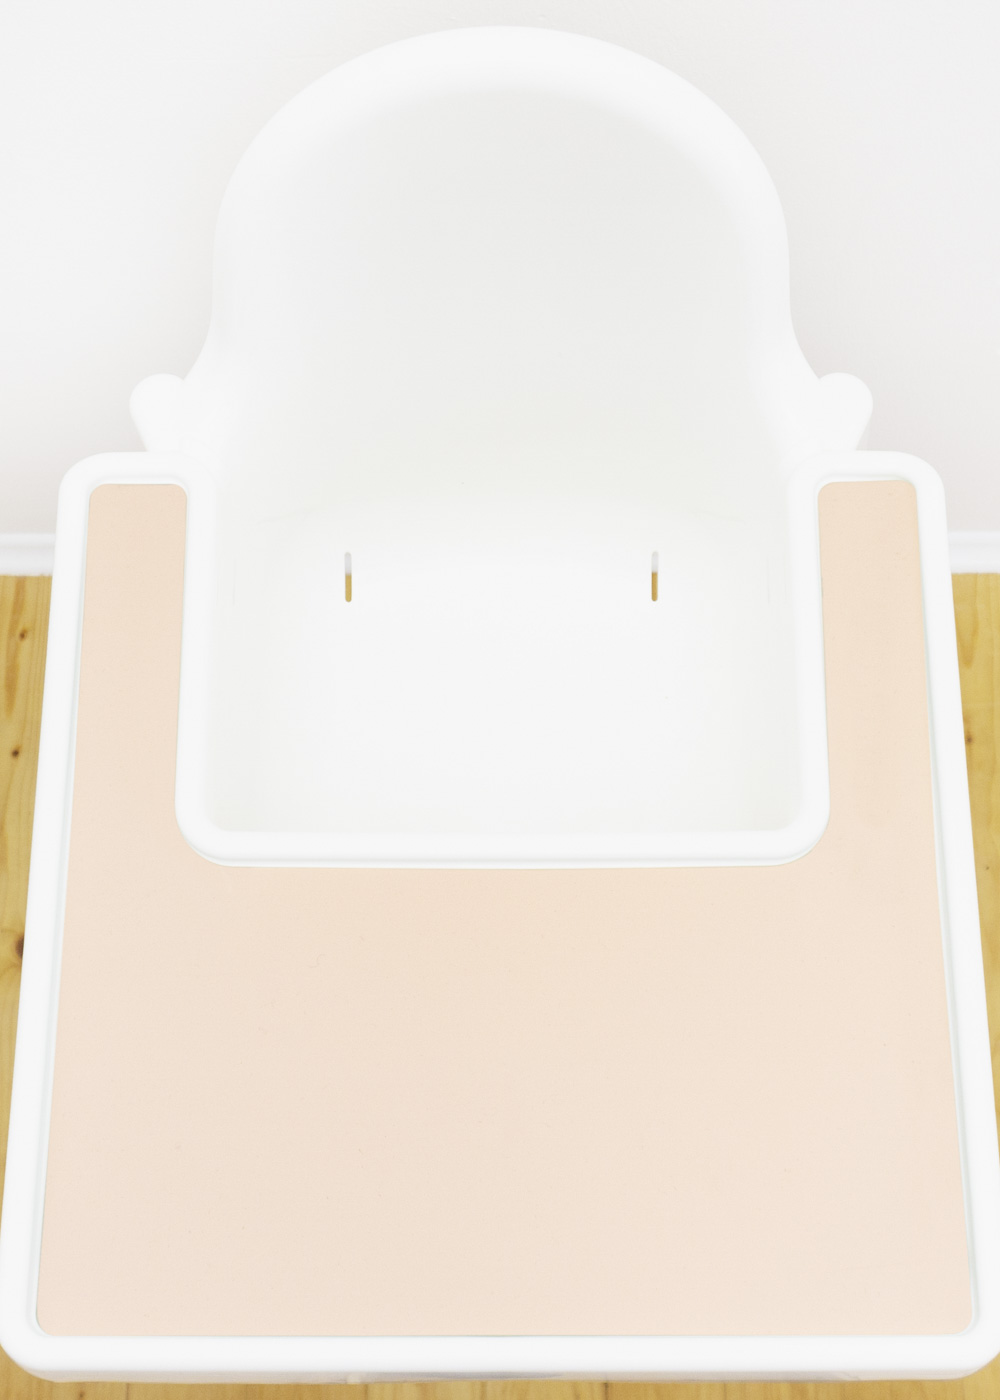 Silikonmatte Ikea Antilop Hochstuhl Klecka Mat creme Gesamtansicht oben